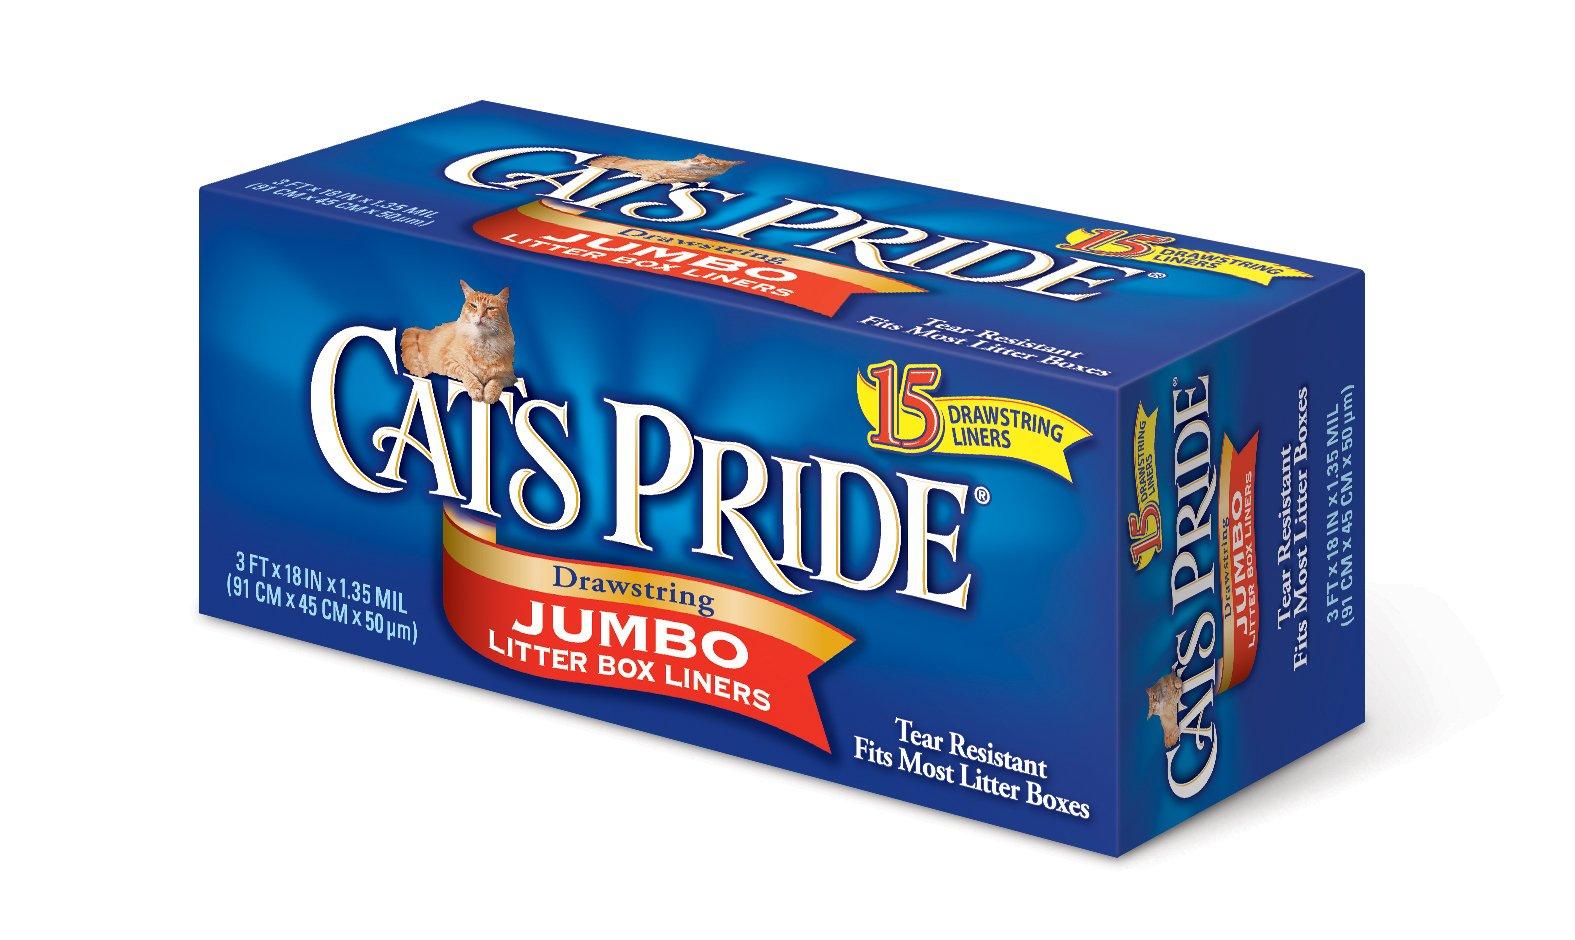 Cat's Pride Drawstring Jumbo Litter Box Liners, 15 Count